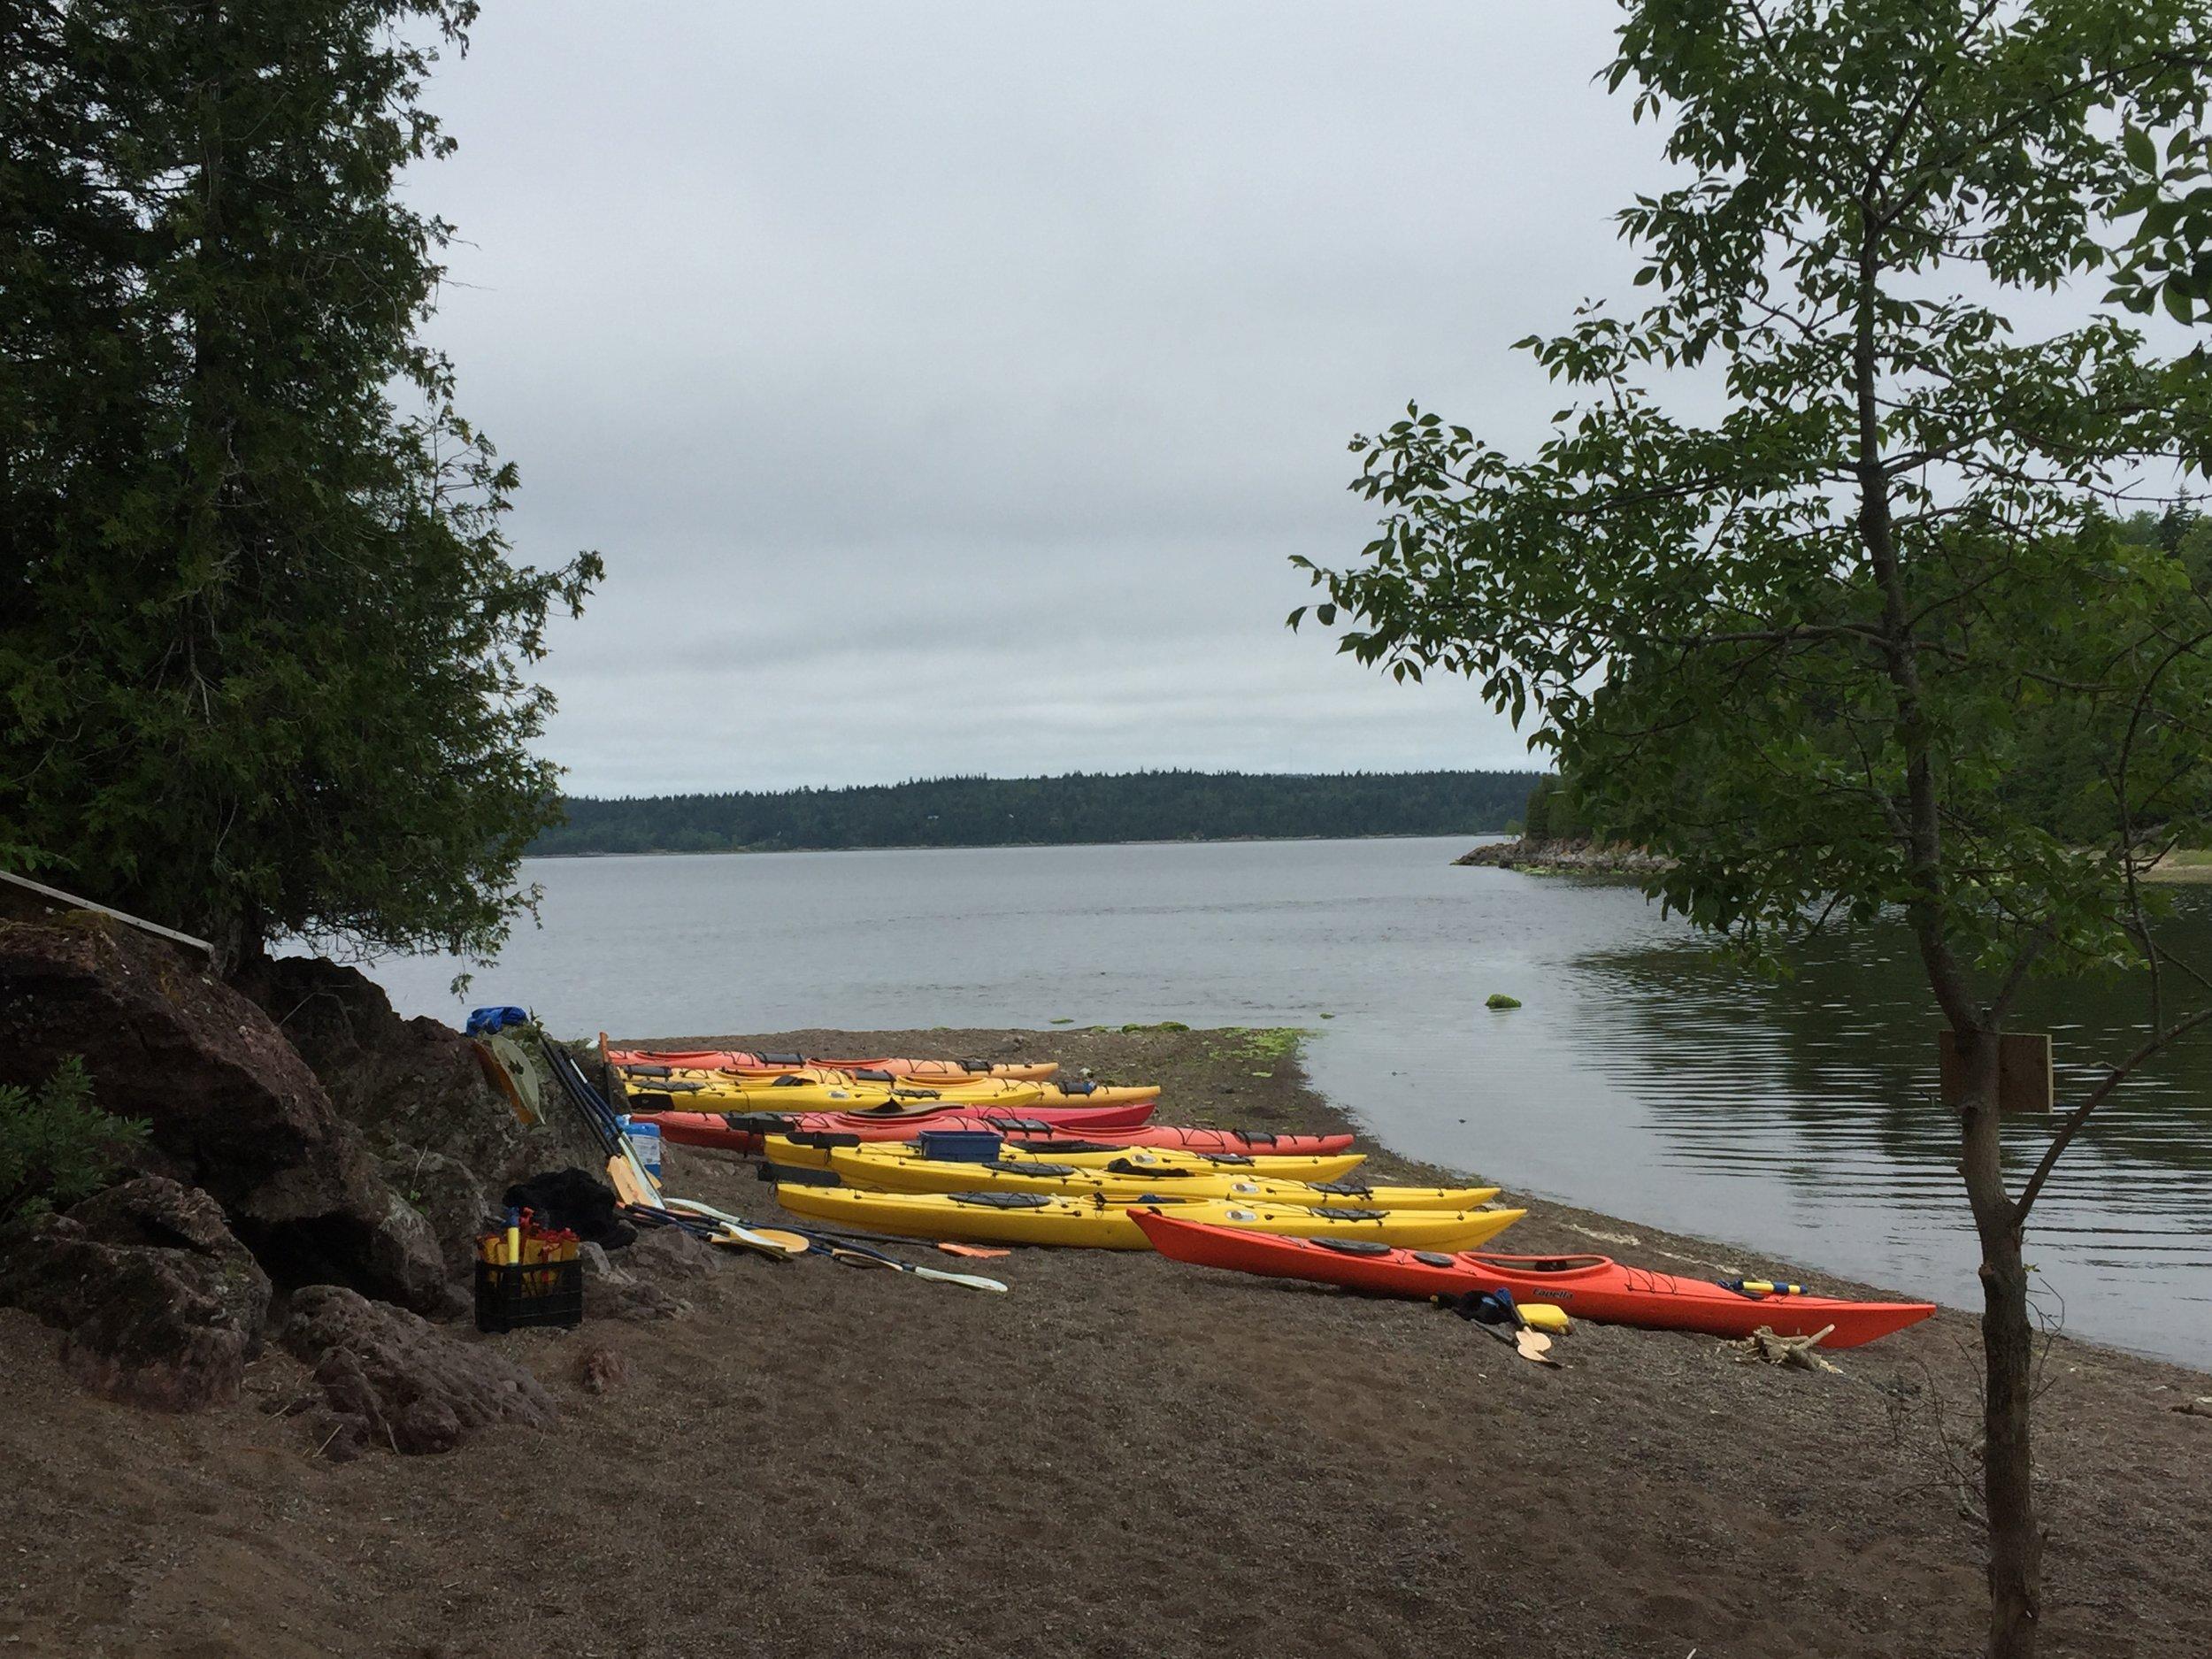 Photo from Lake Ontario Waterkeeper